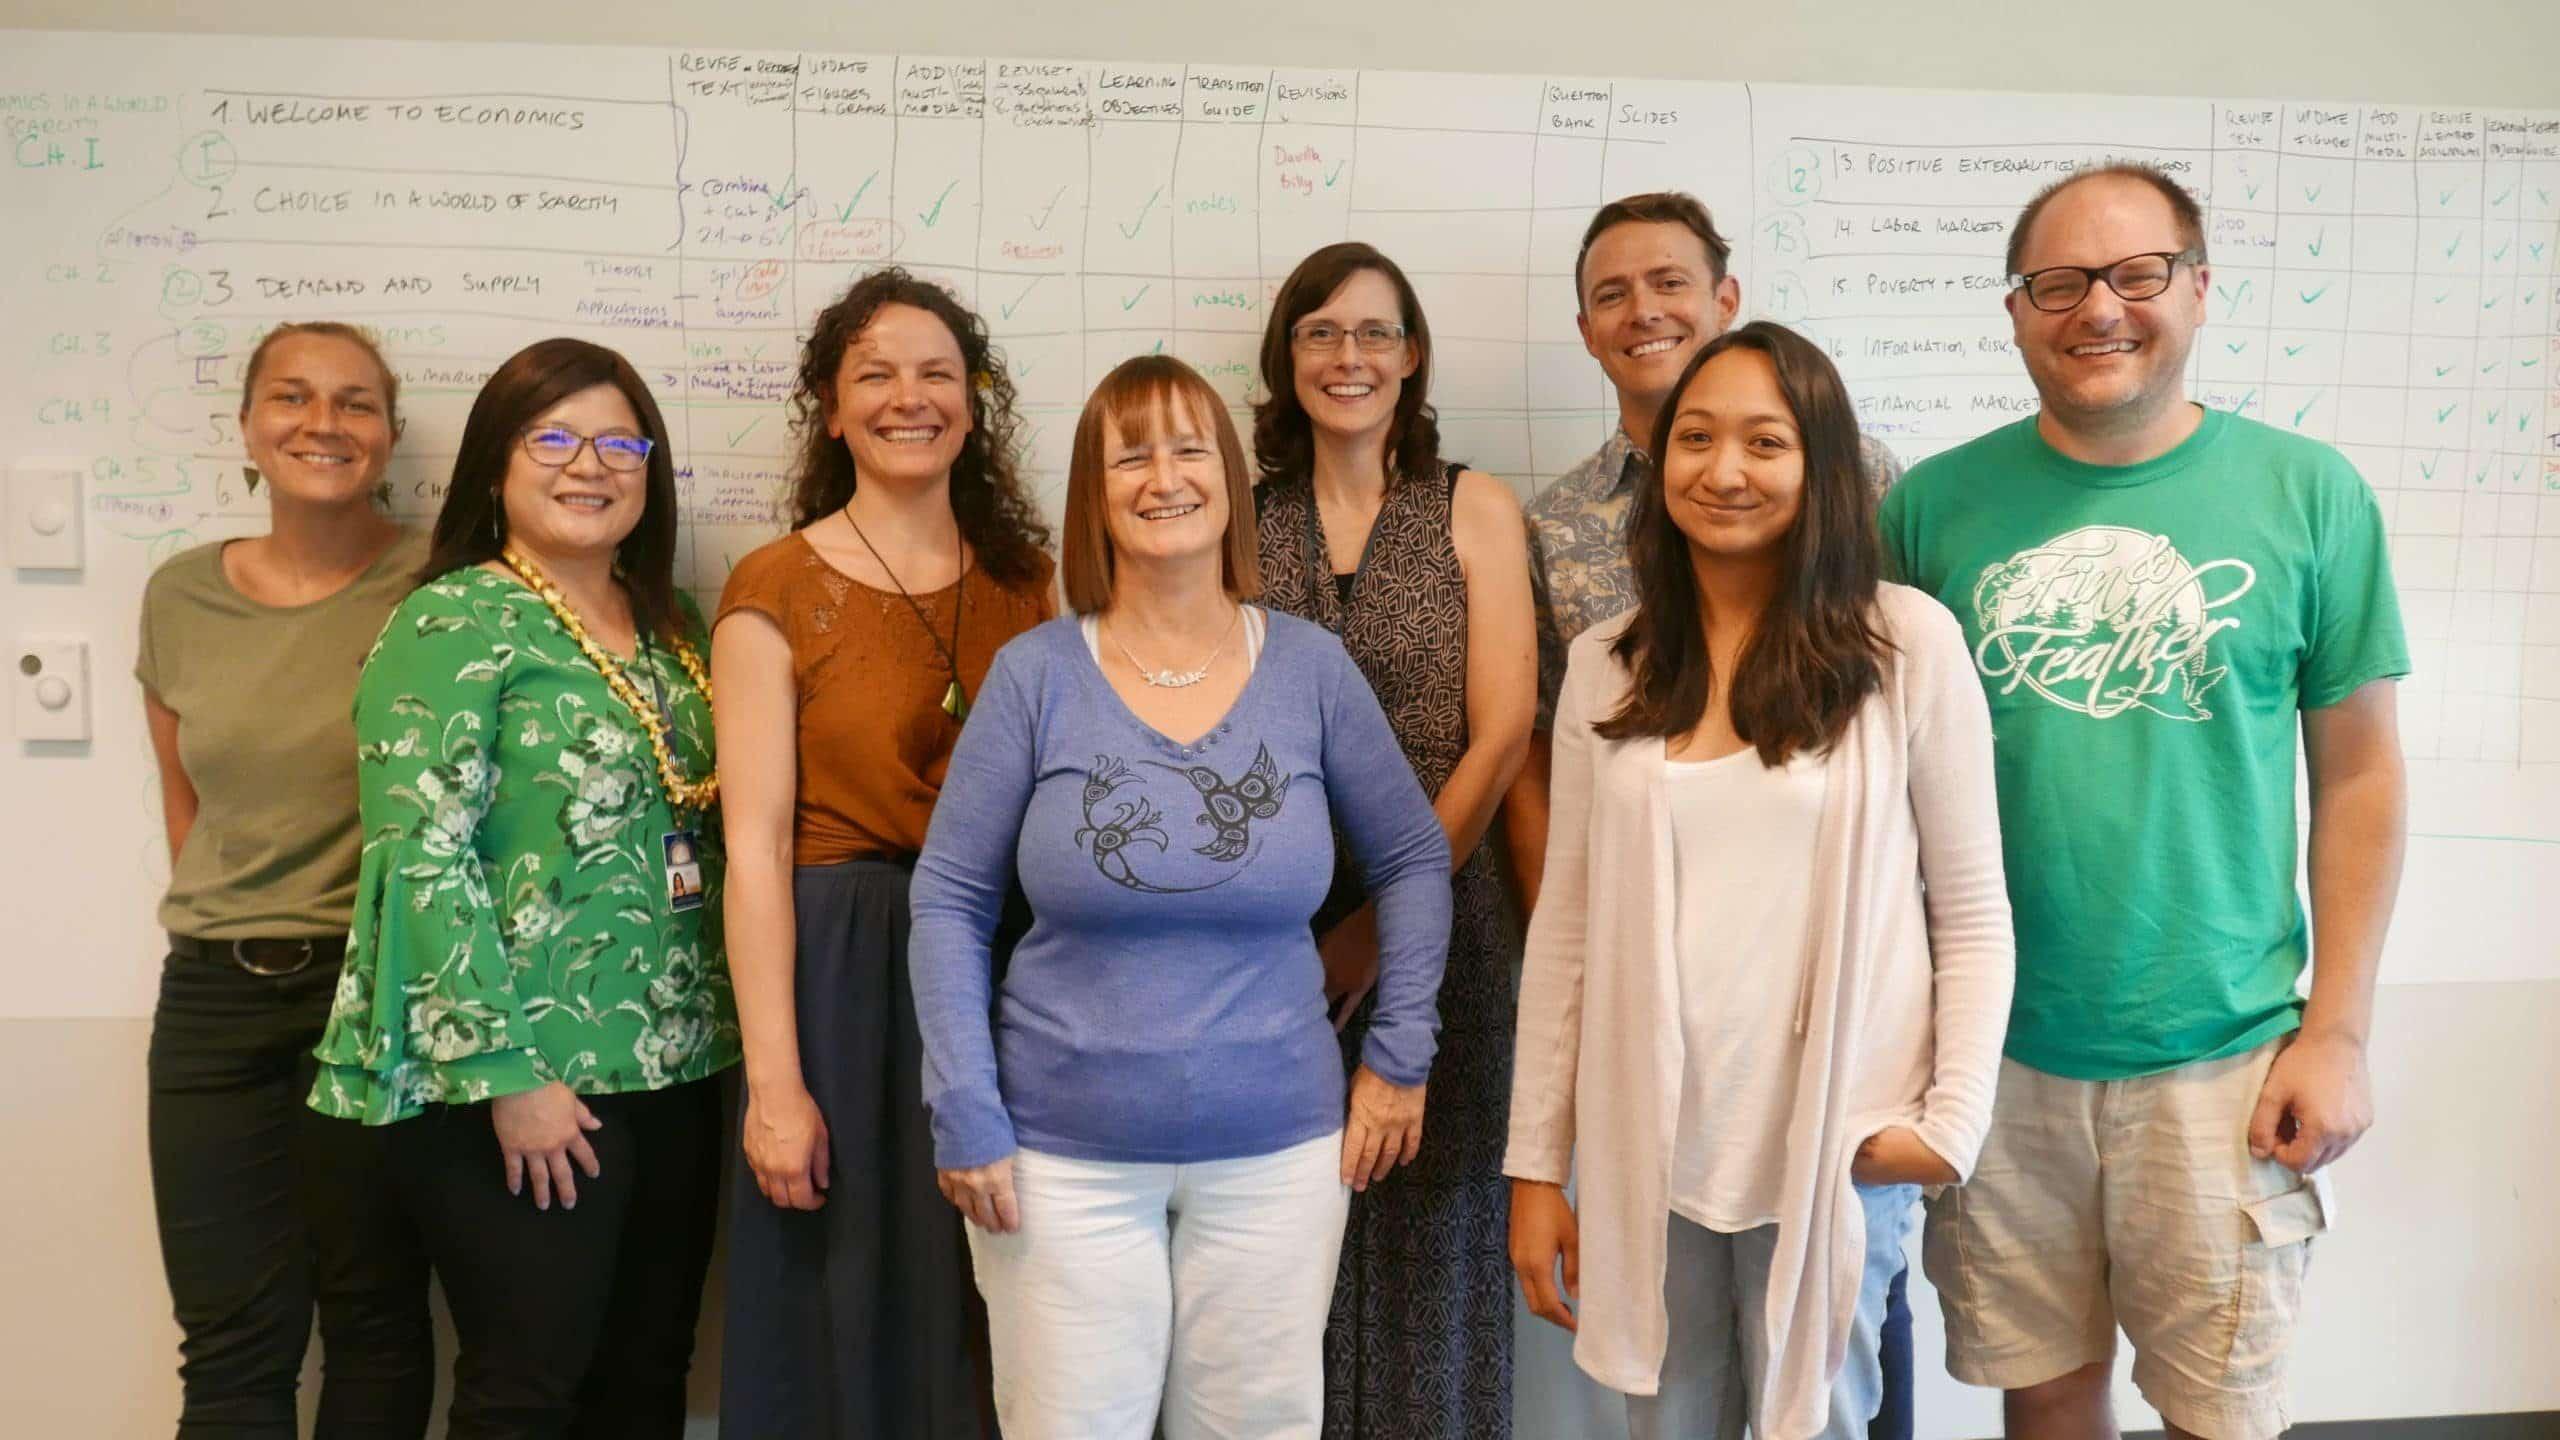 Authors and facilitators of the UH Microeconomics textbook